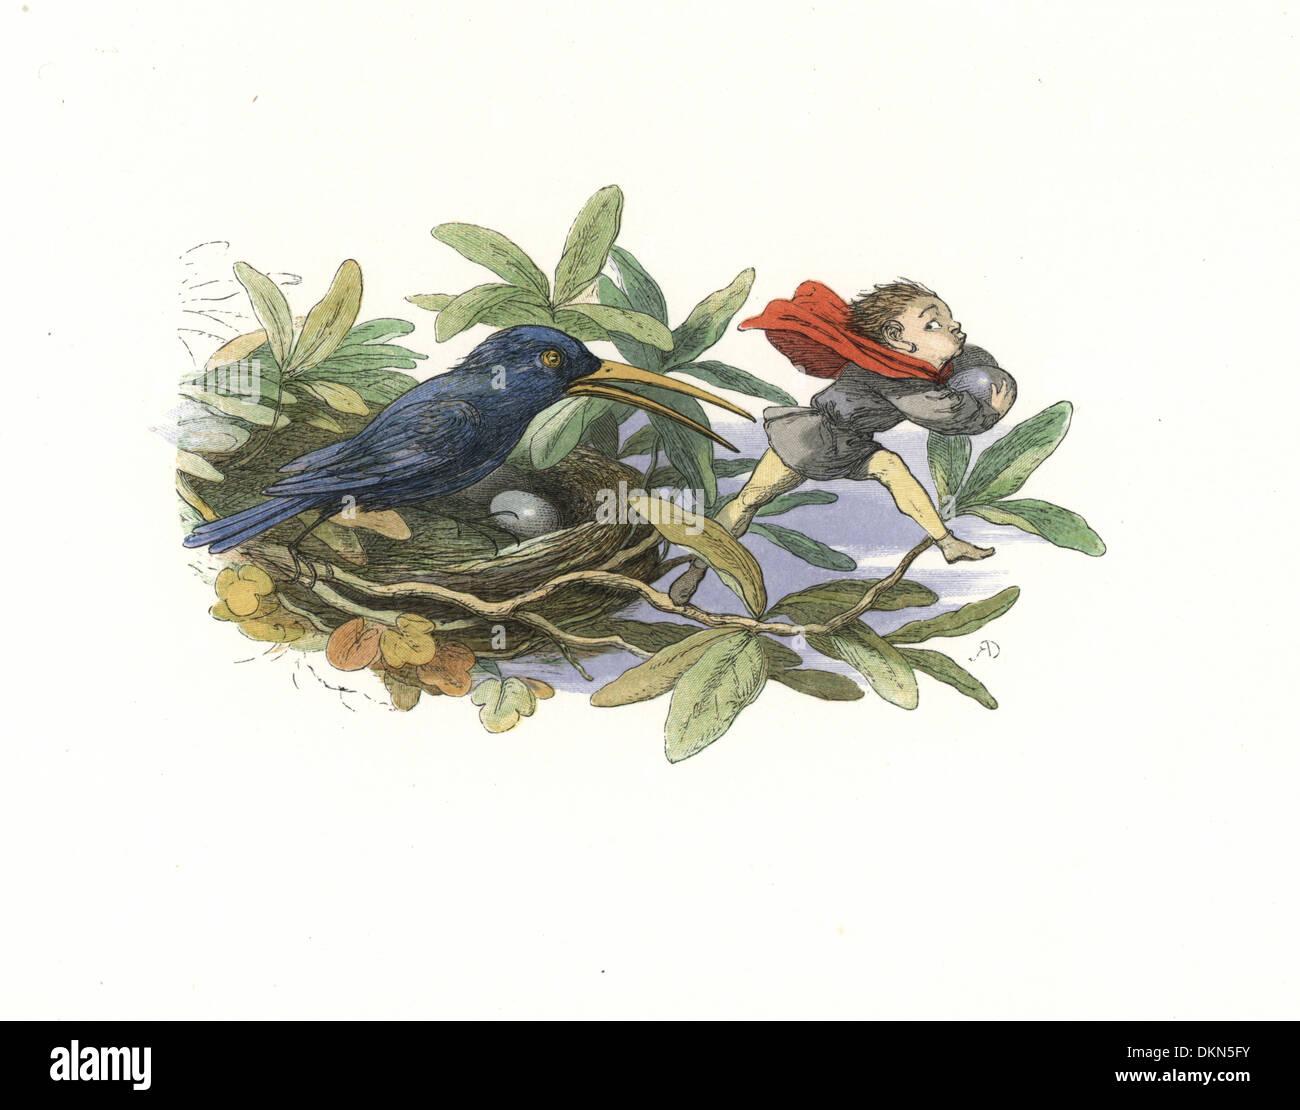 Elf stealing eggs from a bird's nest. - Stock Image